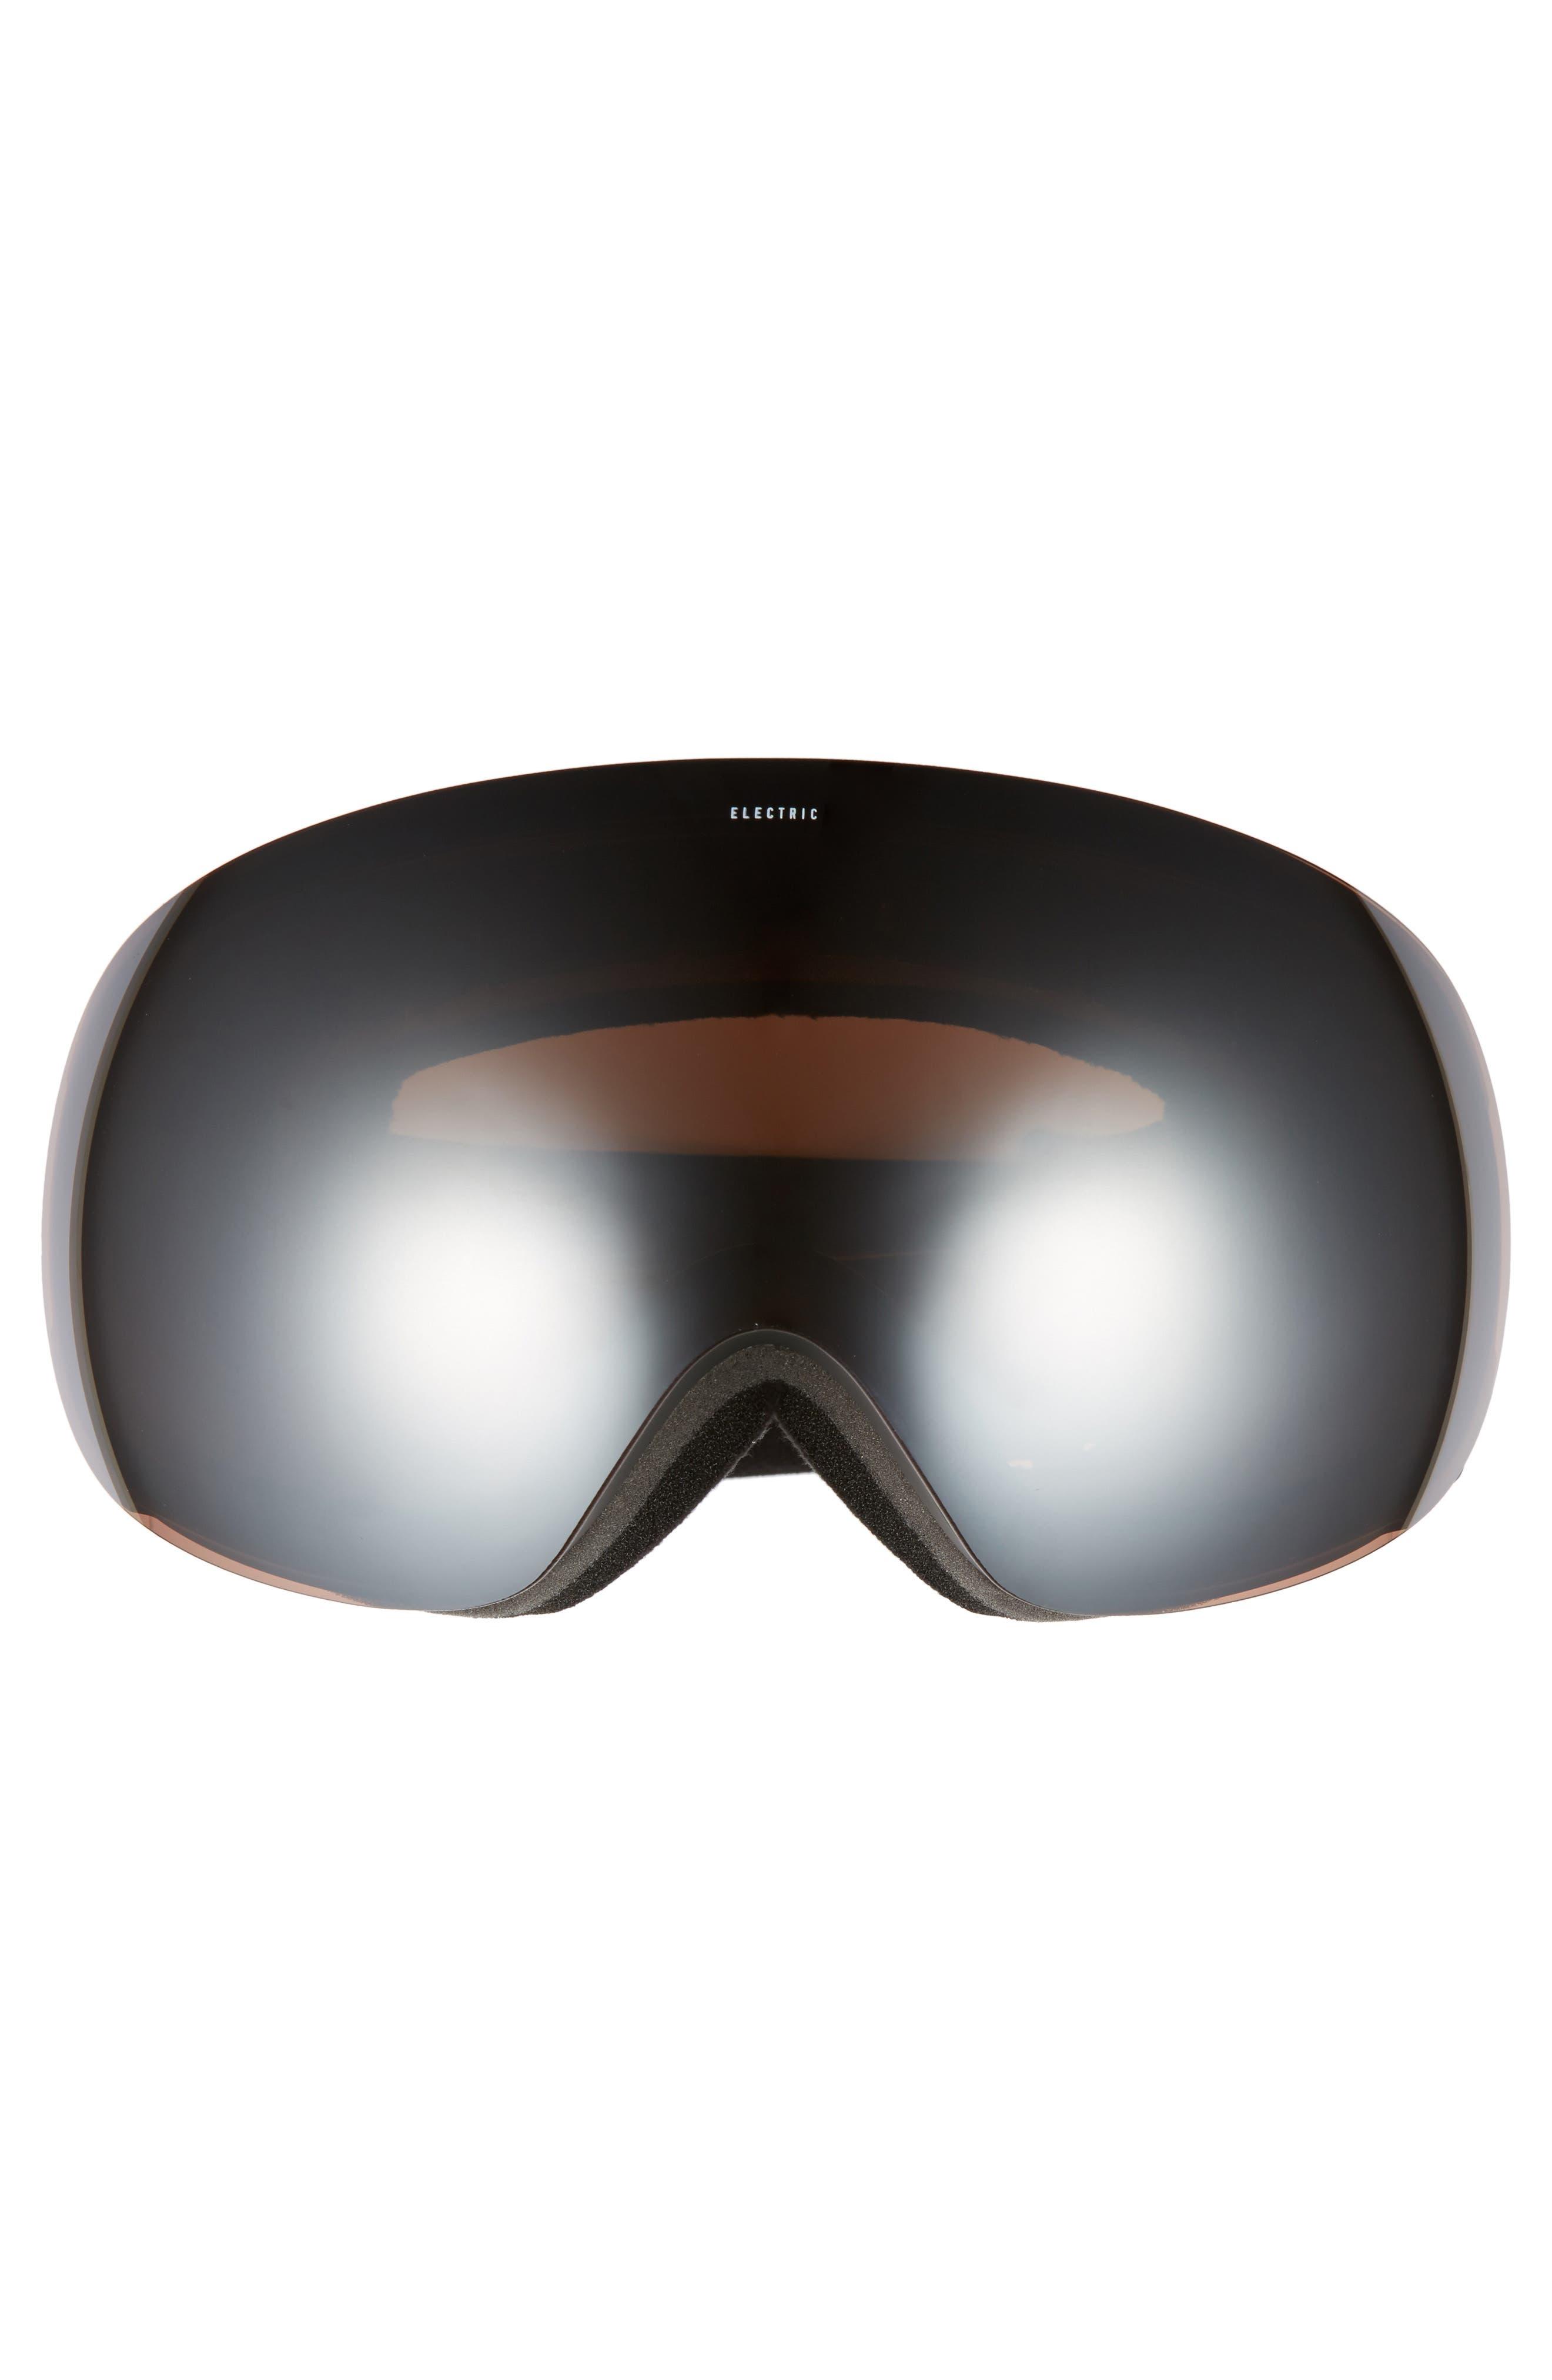 EG3 Snow Goggles,                             Alternate thumbnail 3, color,                             Matte Black/ Silver Chrome